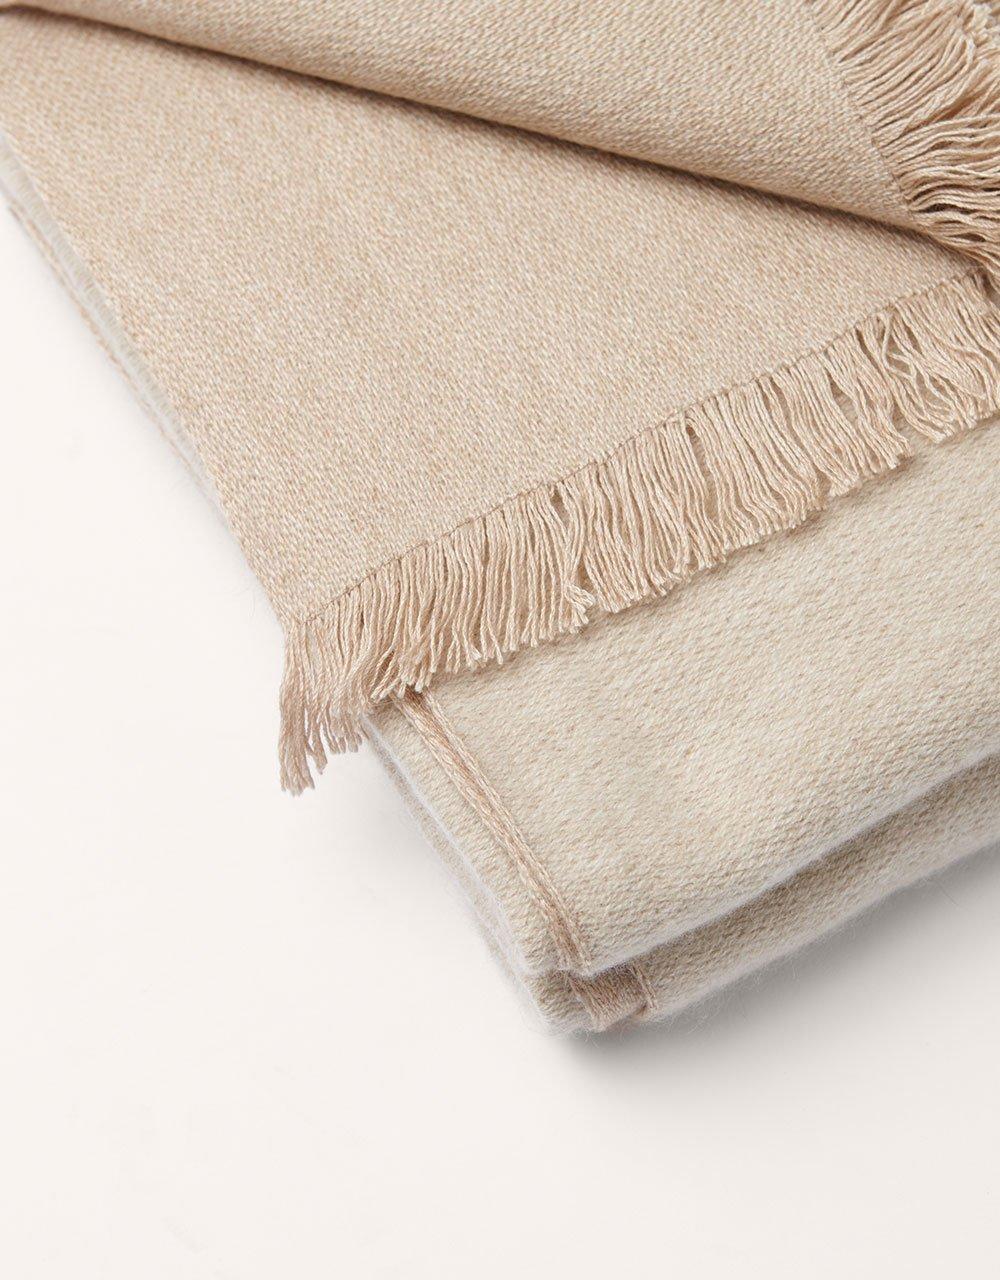 blanket04c